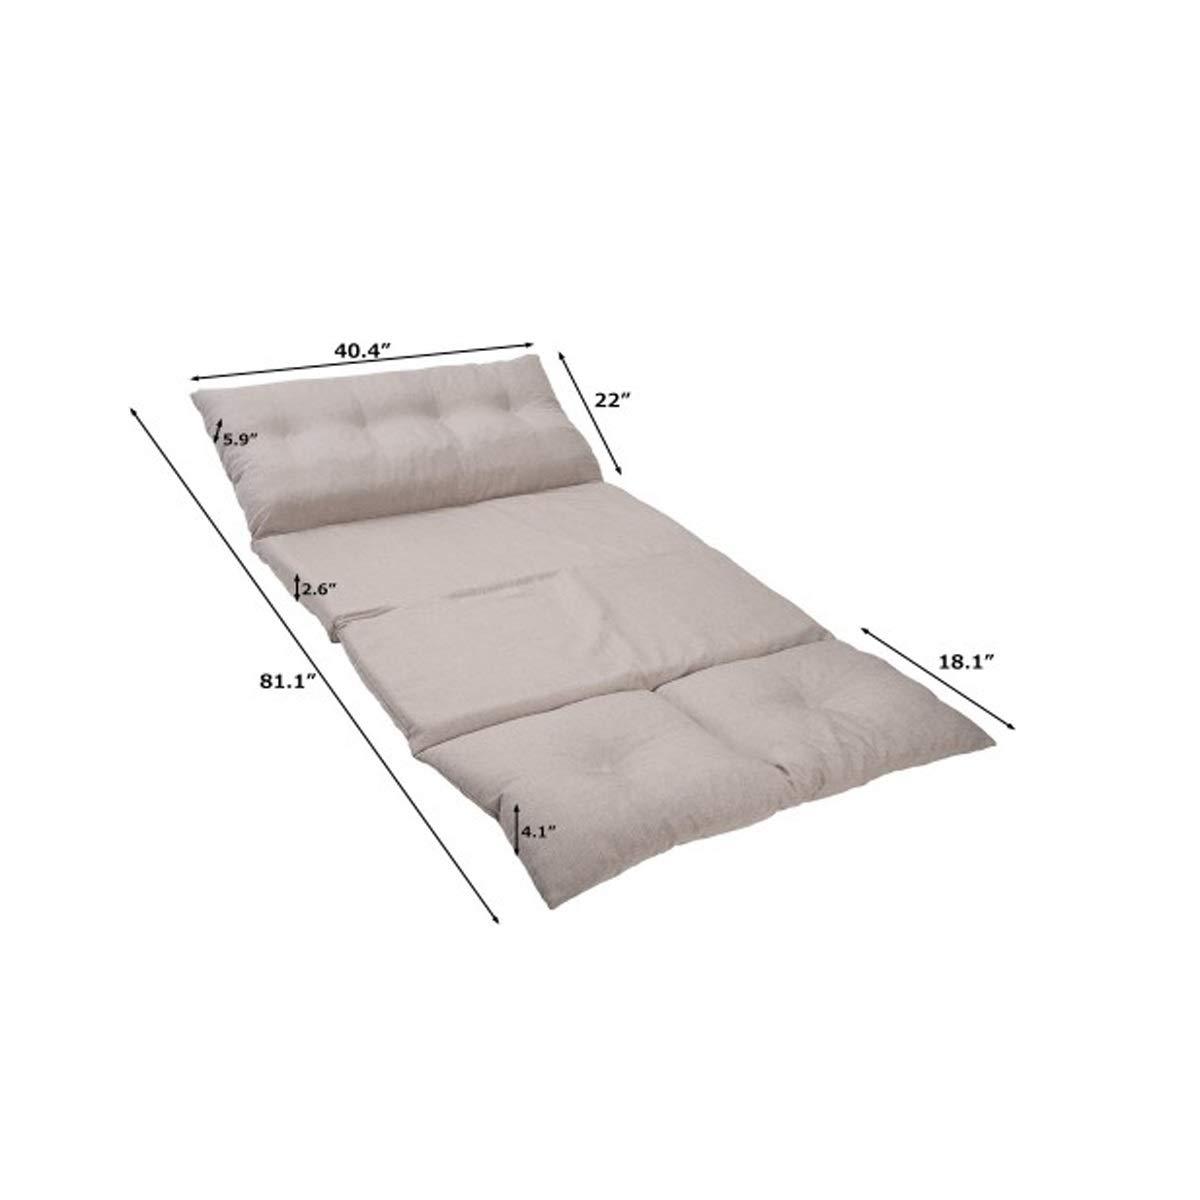 Super Amazon Com Zhic Sofa Adjustable Fabric Folding Chaise Creativecarmelina Interior Chair Design Creativecarmelinacom